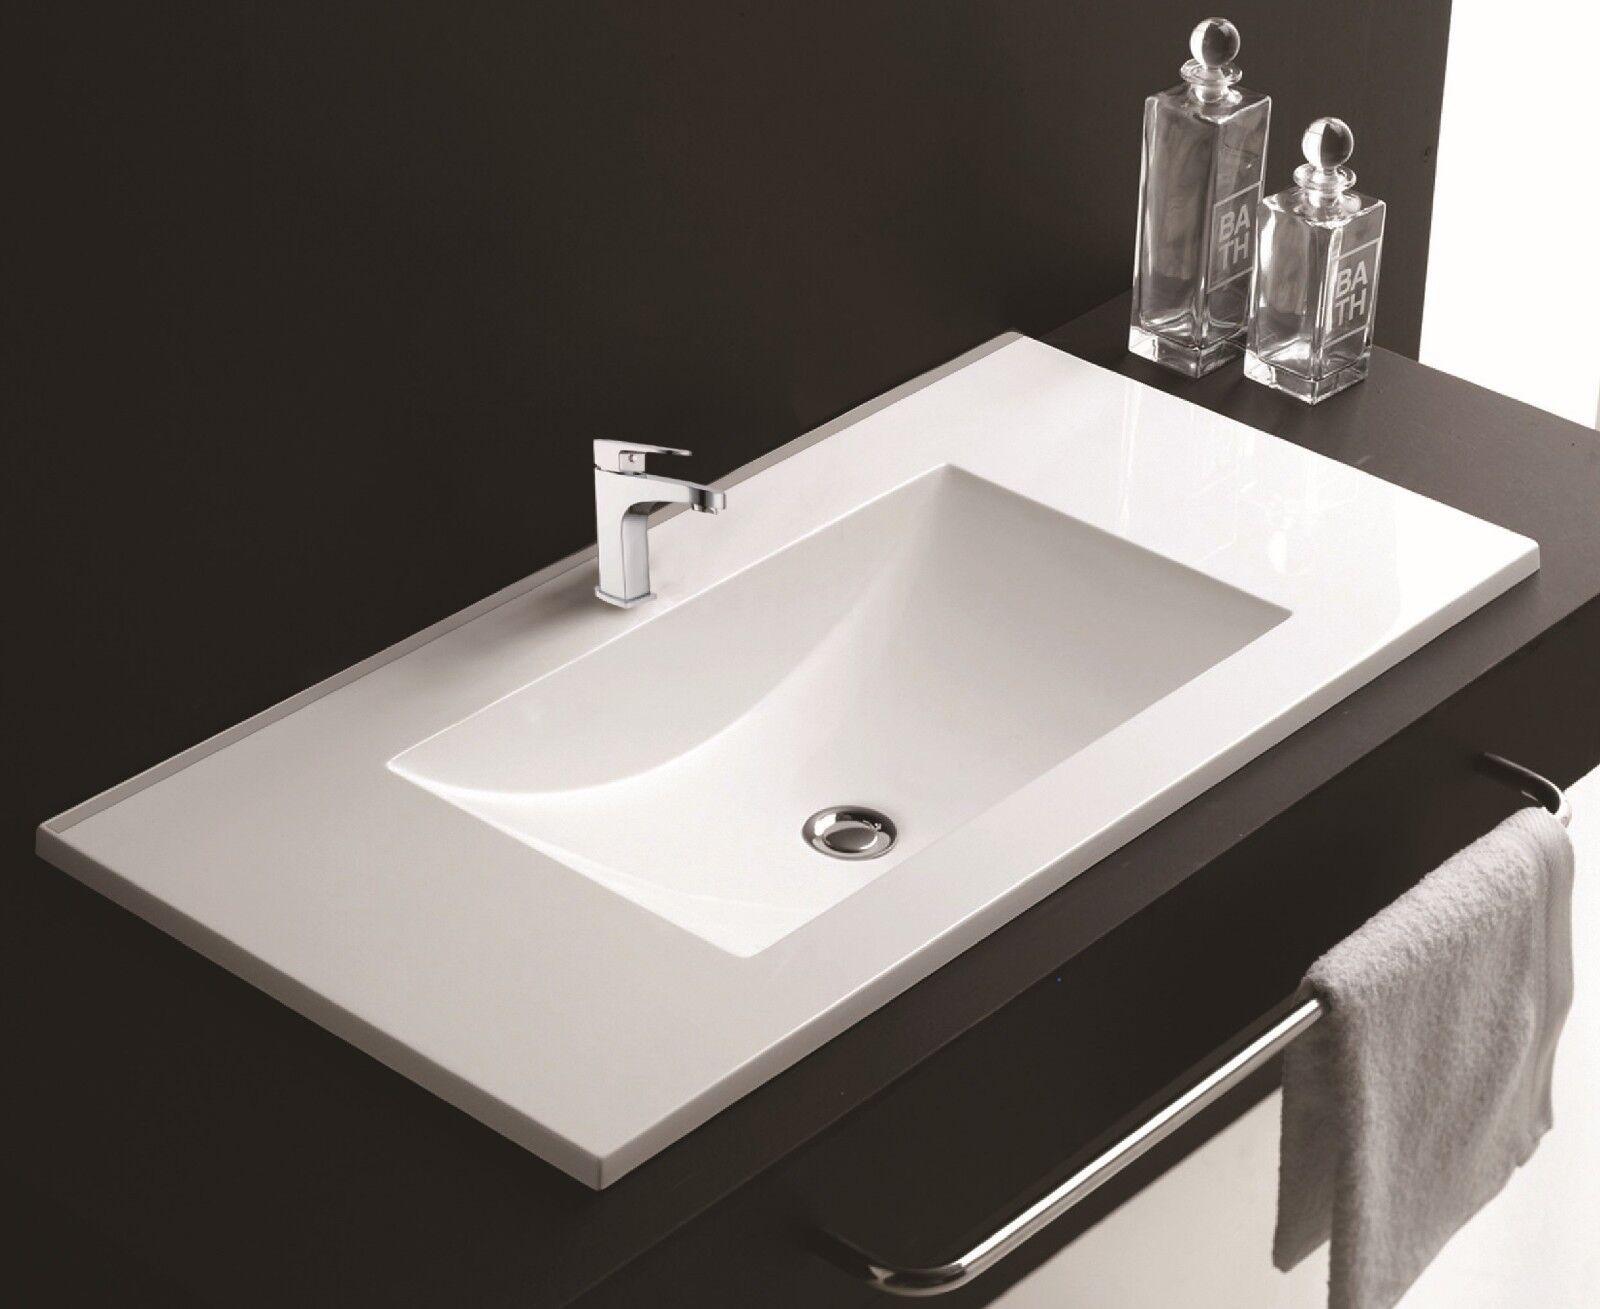 900mm Bathroom Rectangular Cabinet Mounted Basin Modern Ceramic Sink